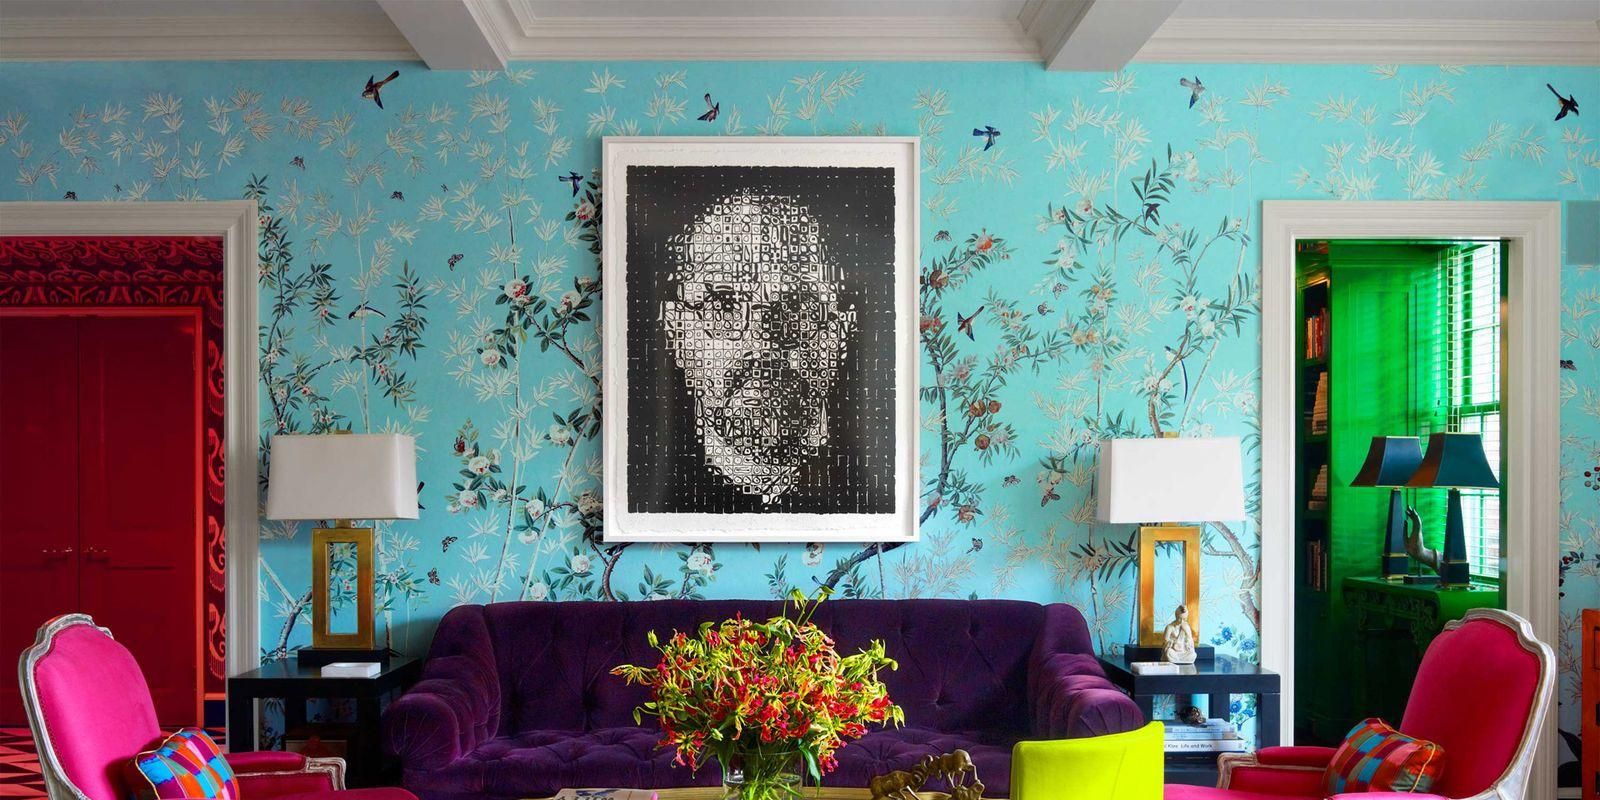 Wonderful Furniture : Second Hand Furniture Yorkshire Uk 1600 x 800 · 240 kB · jpeg